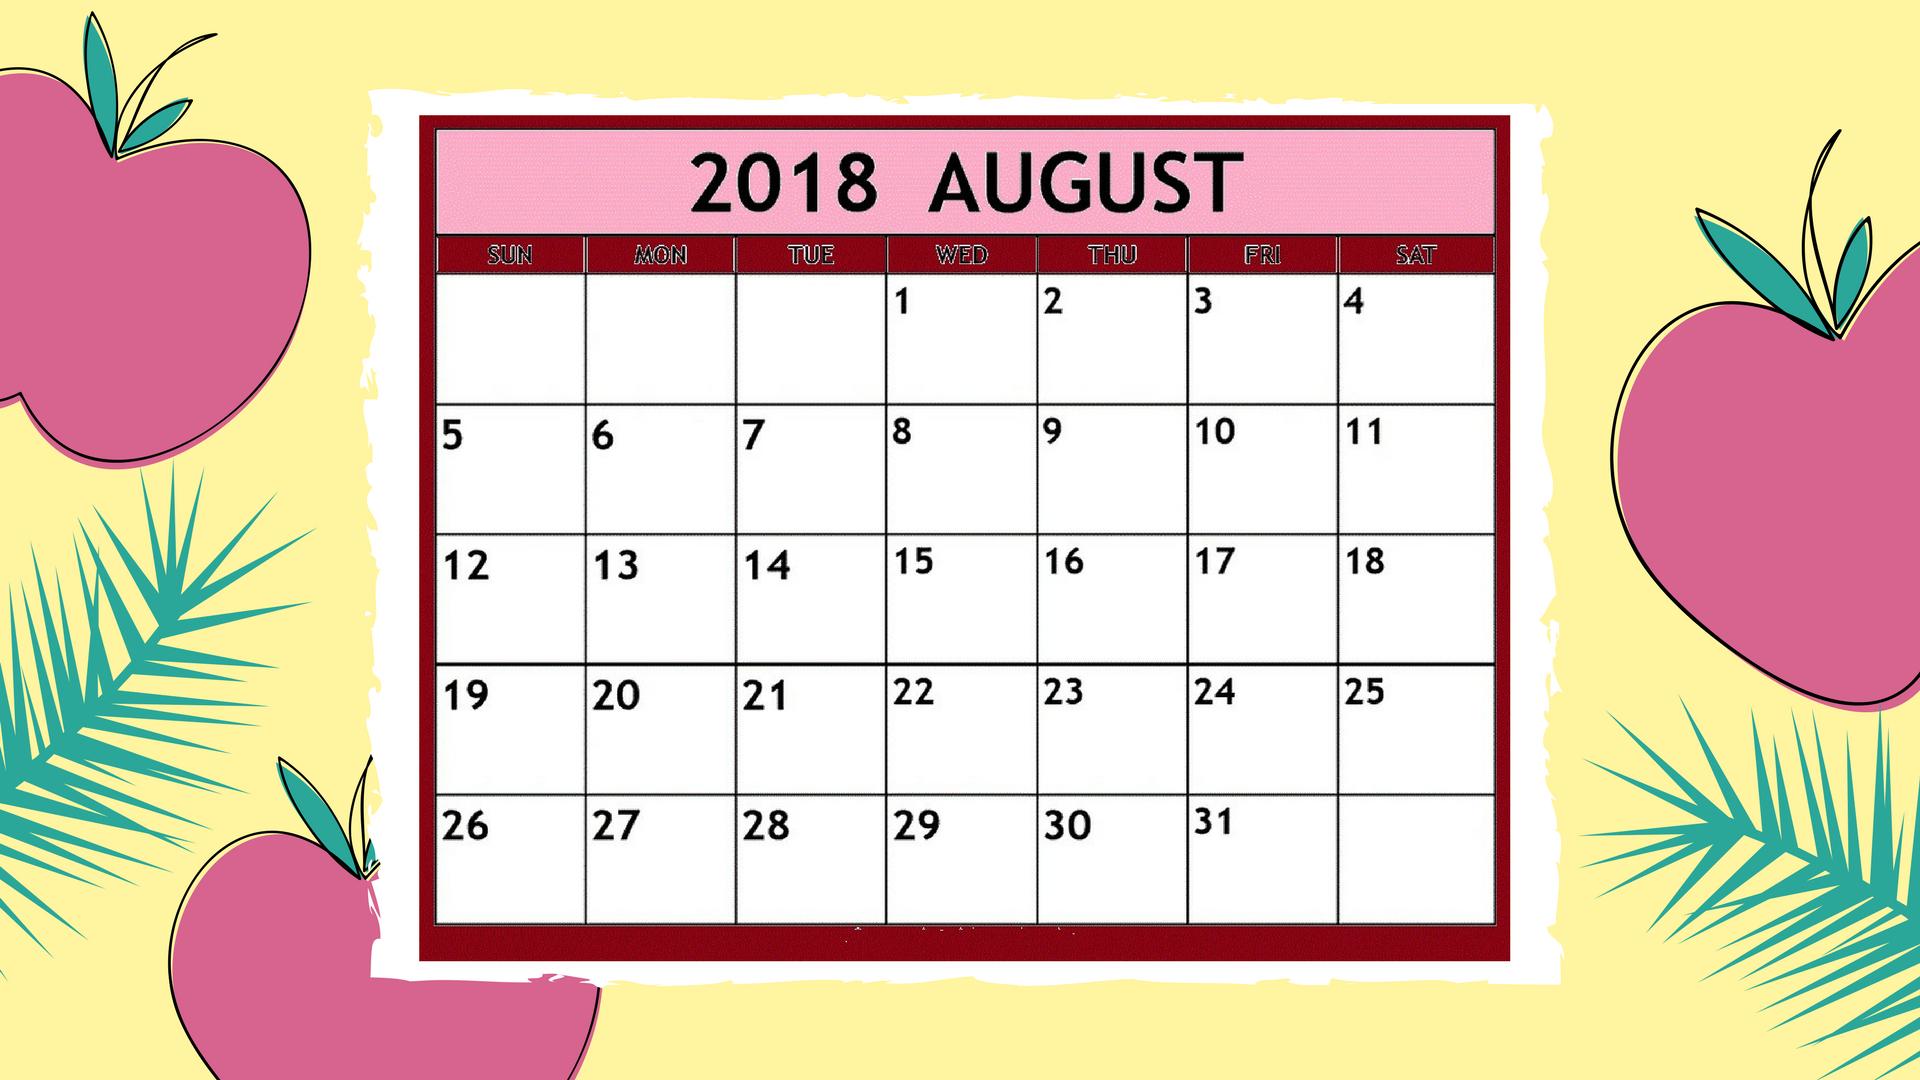 August 2018 Calendar Templates With Holidays - Timedatecalendar within Aug Calendar Clip Art Template